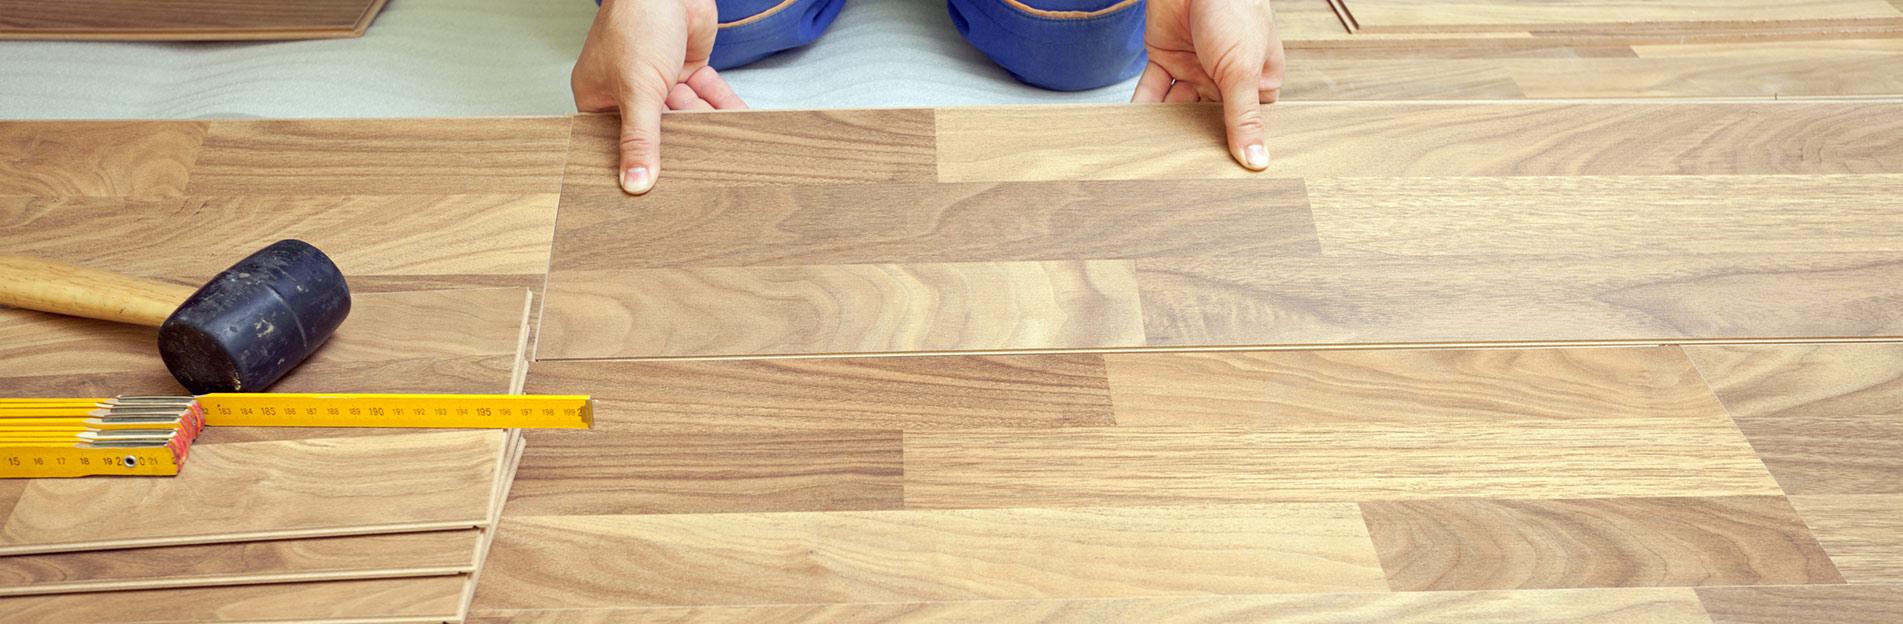 Flooring Store In Oklahoma City OK Flooring Contractor - Commercial flooring okc